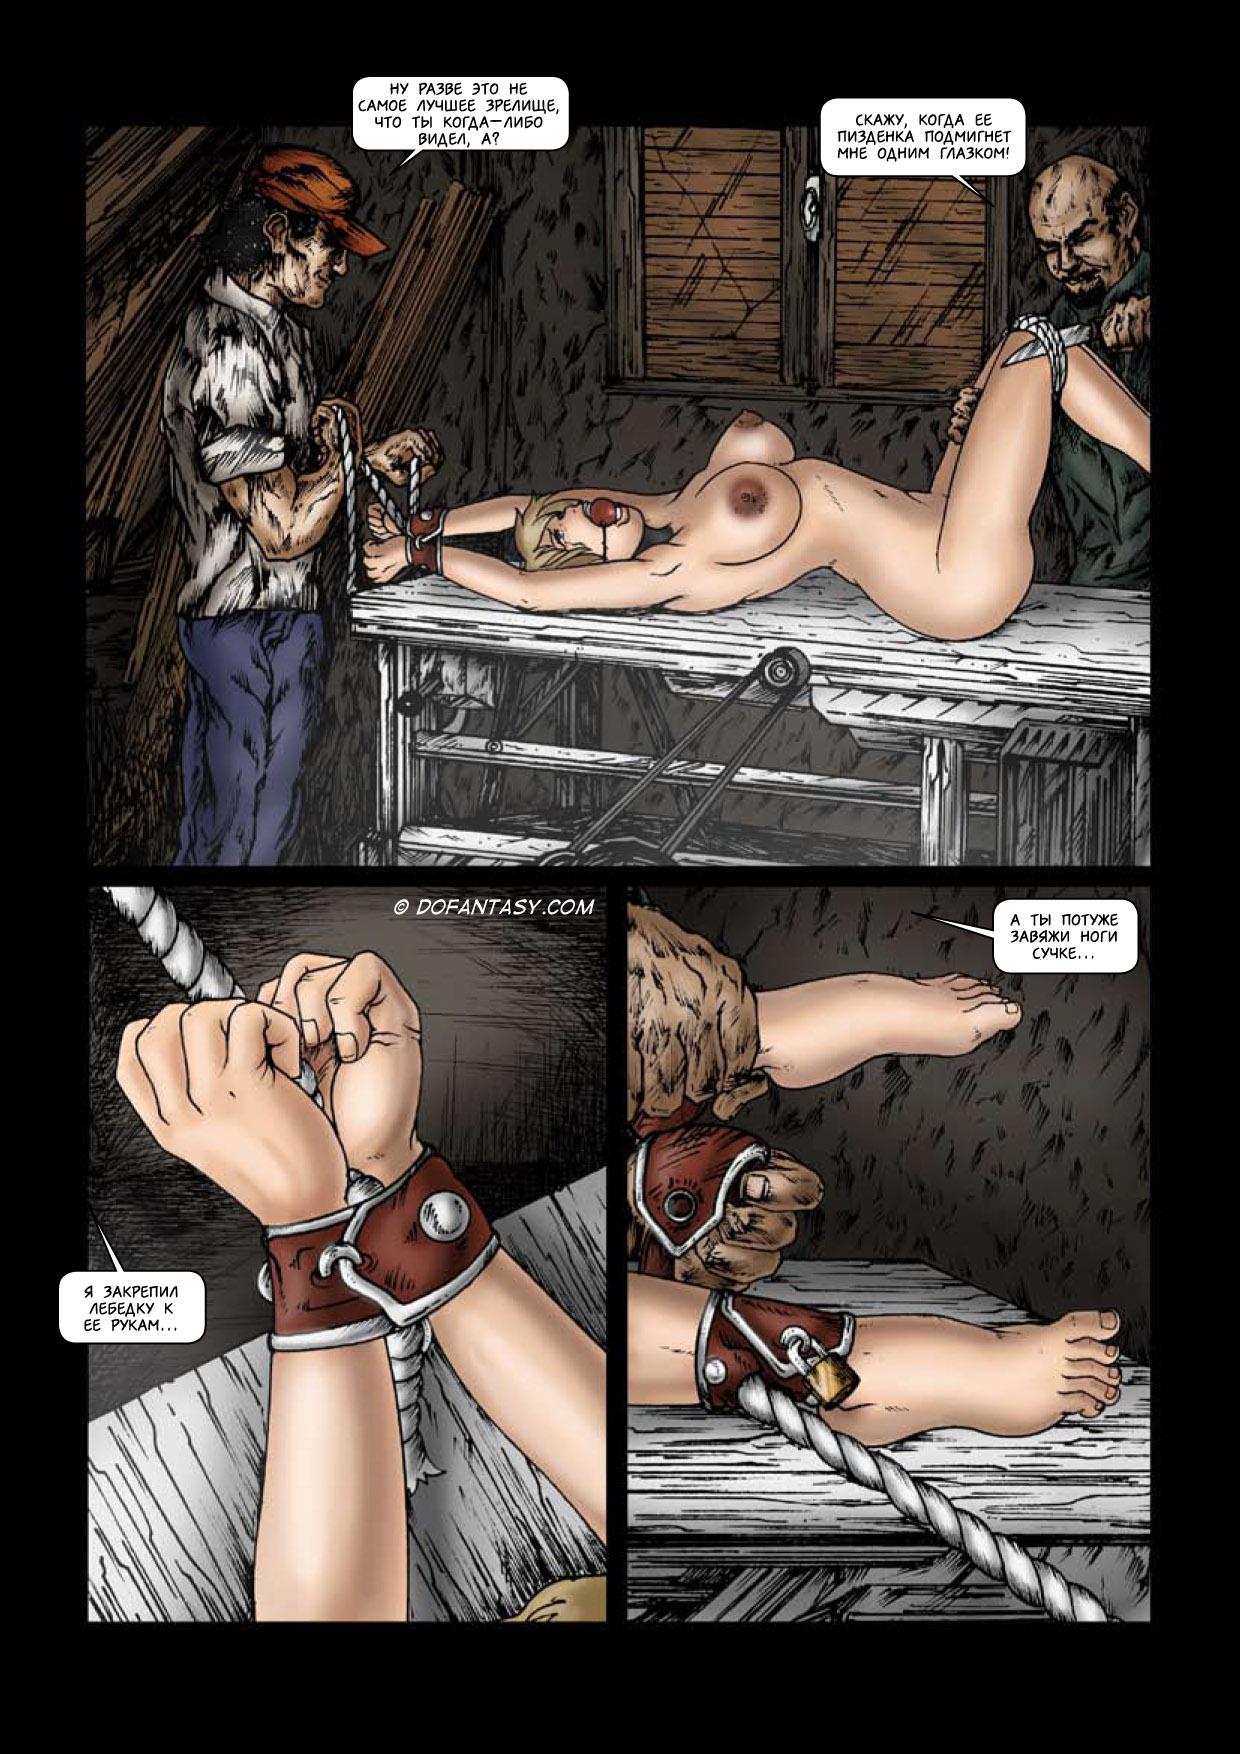 Порно фото мультяшки discussion